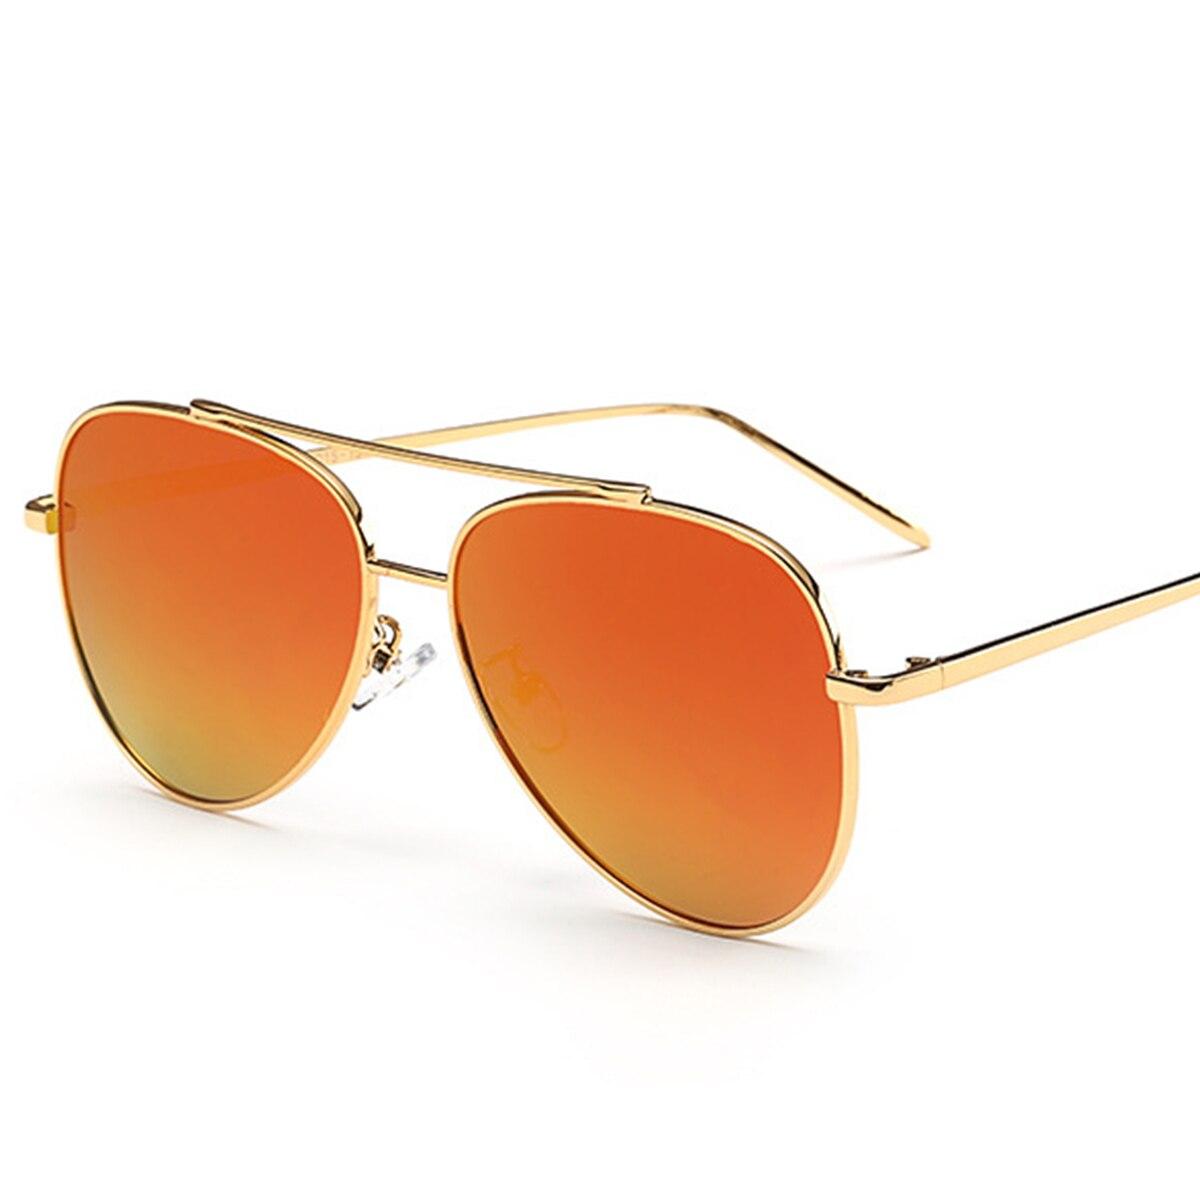 sunglasses summer self portrait 3rd grade - HD1200×1200